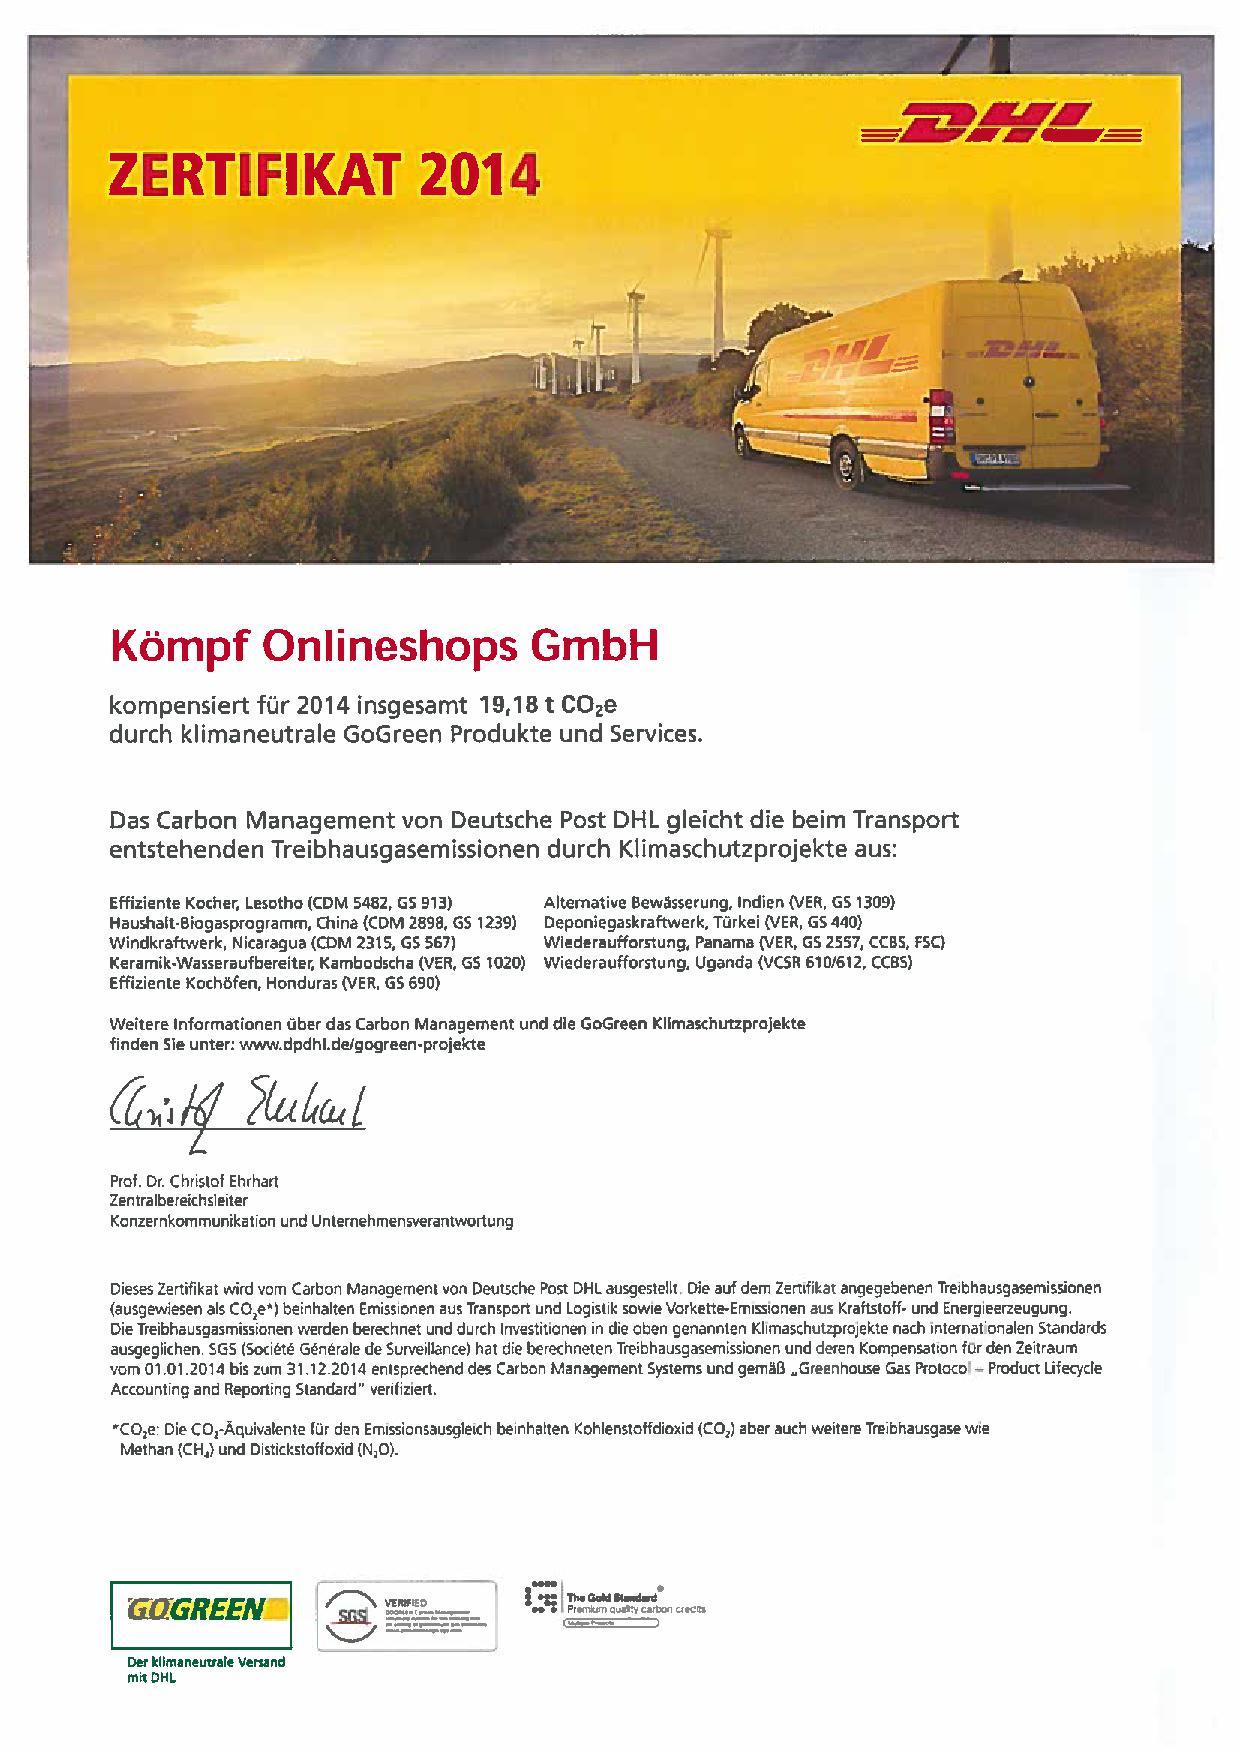 DHL GoGreen Zertifikat